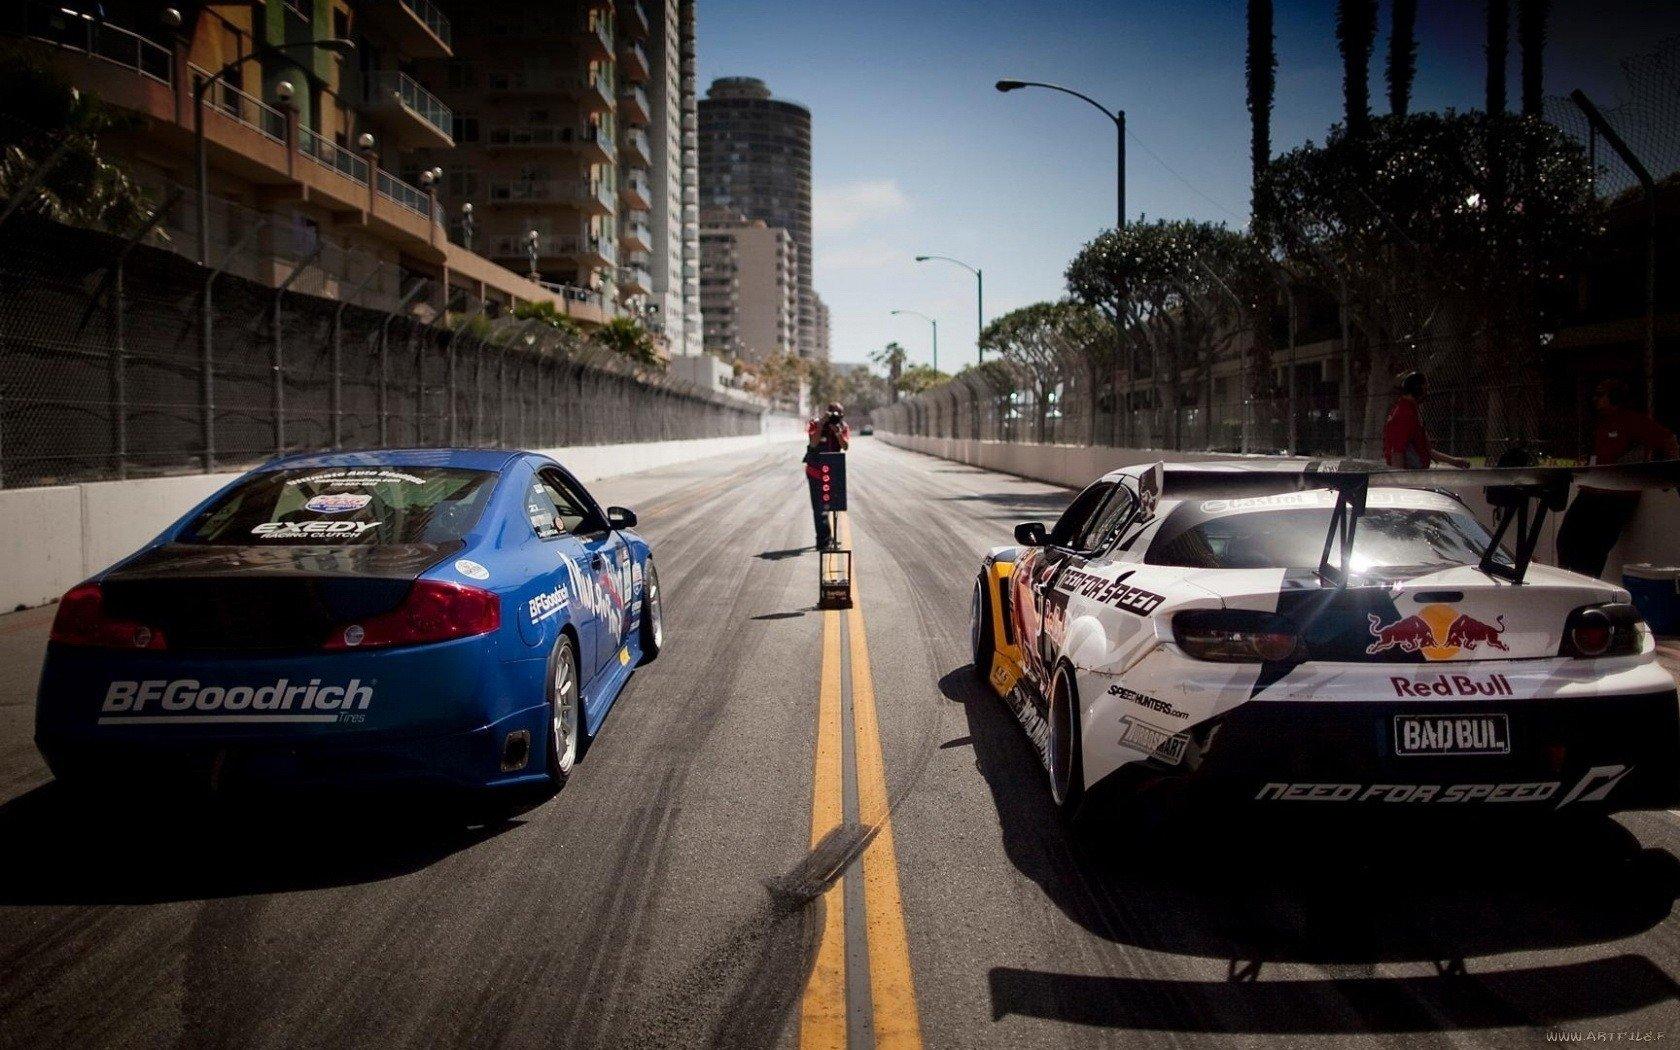 Hd Wallpaper - Drag Racing , HD Wallpaper & Backgrounds